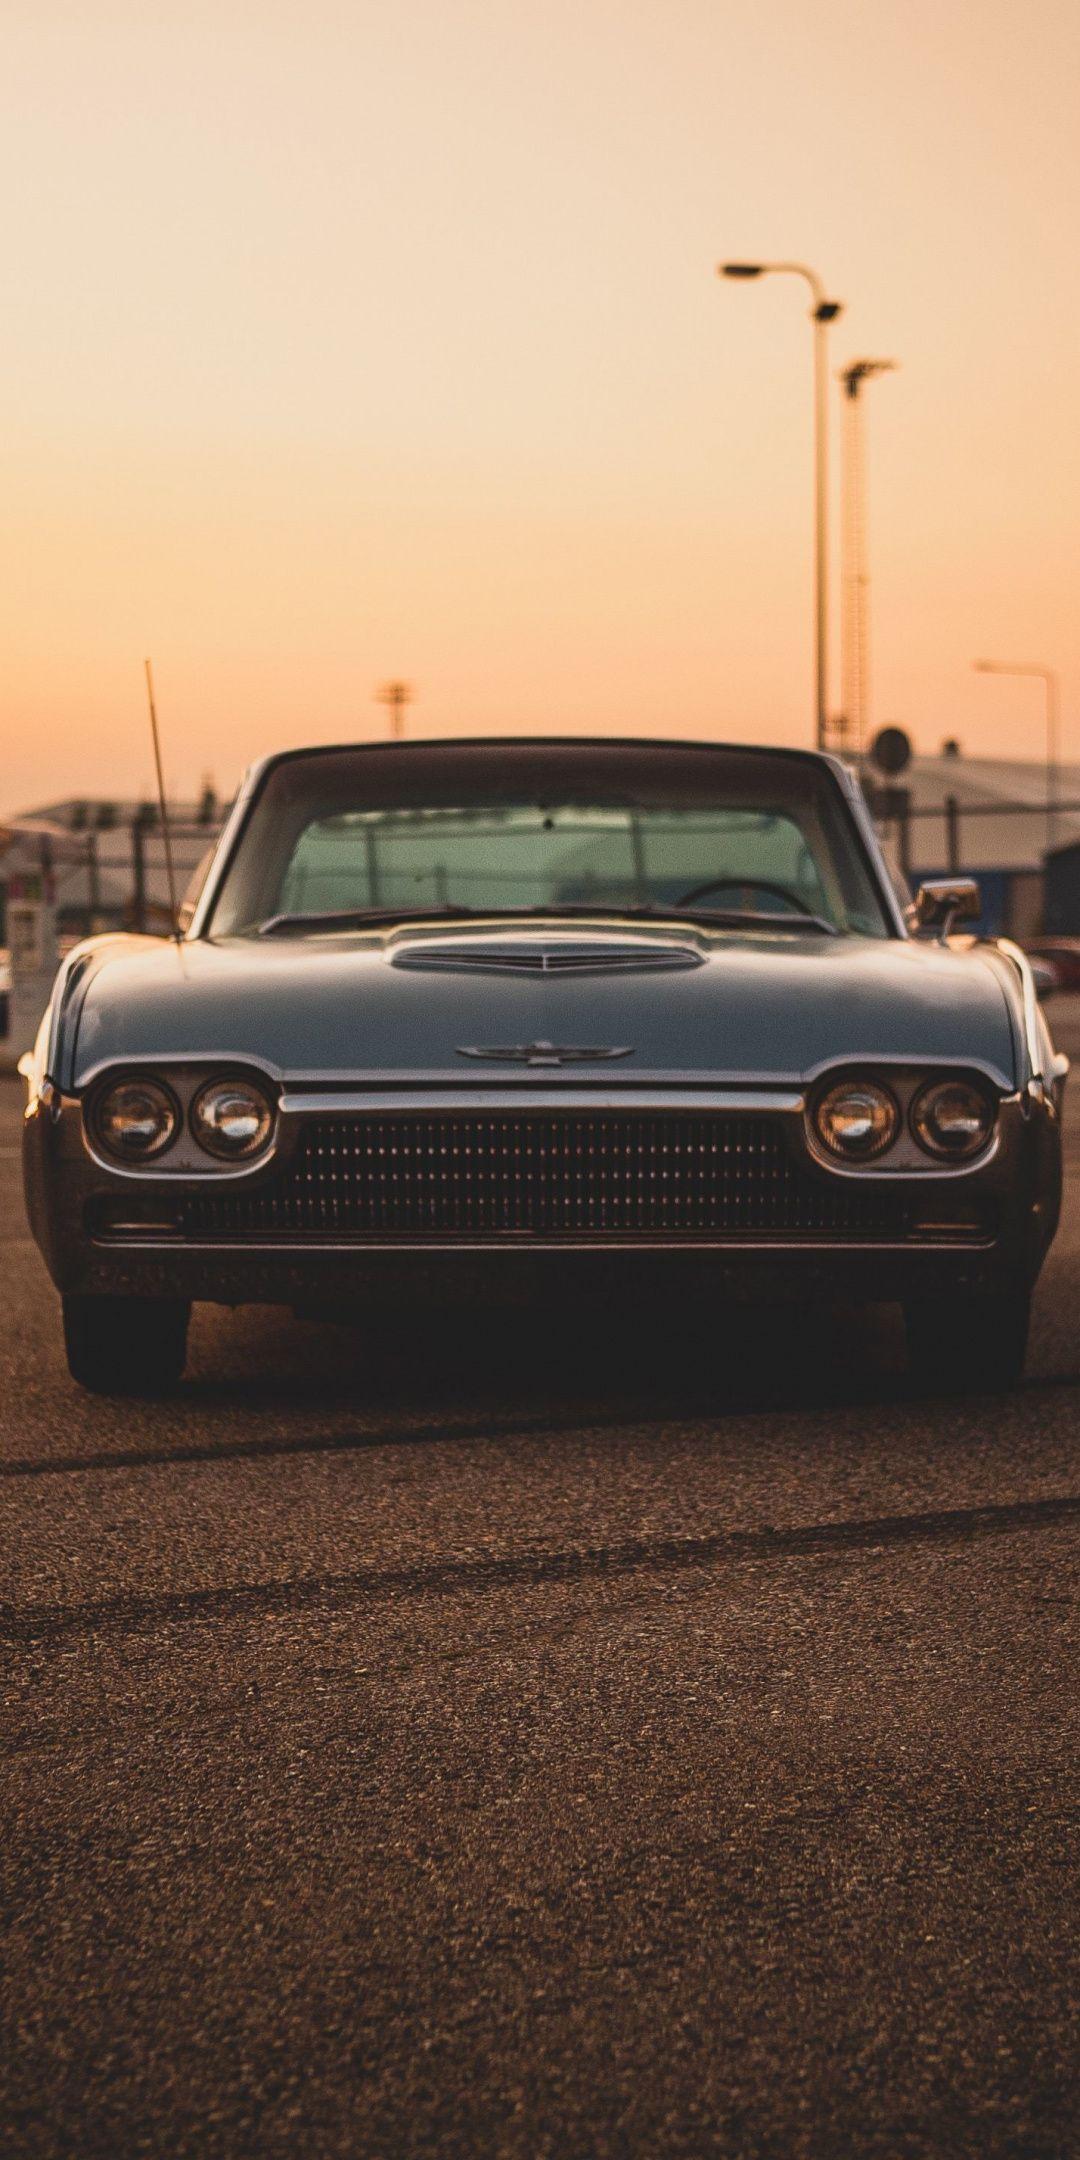 1080×2160 Ford Thunderbird 63, Ford car, classic car wallpaper